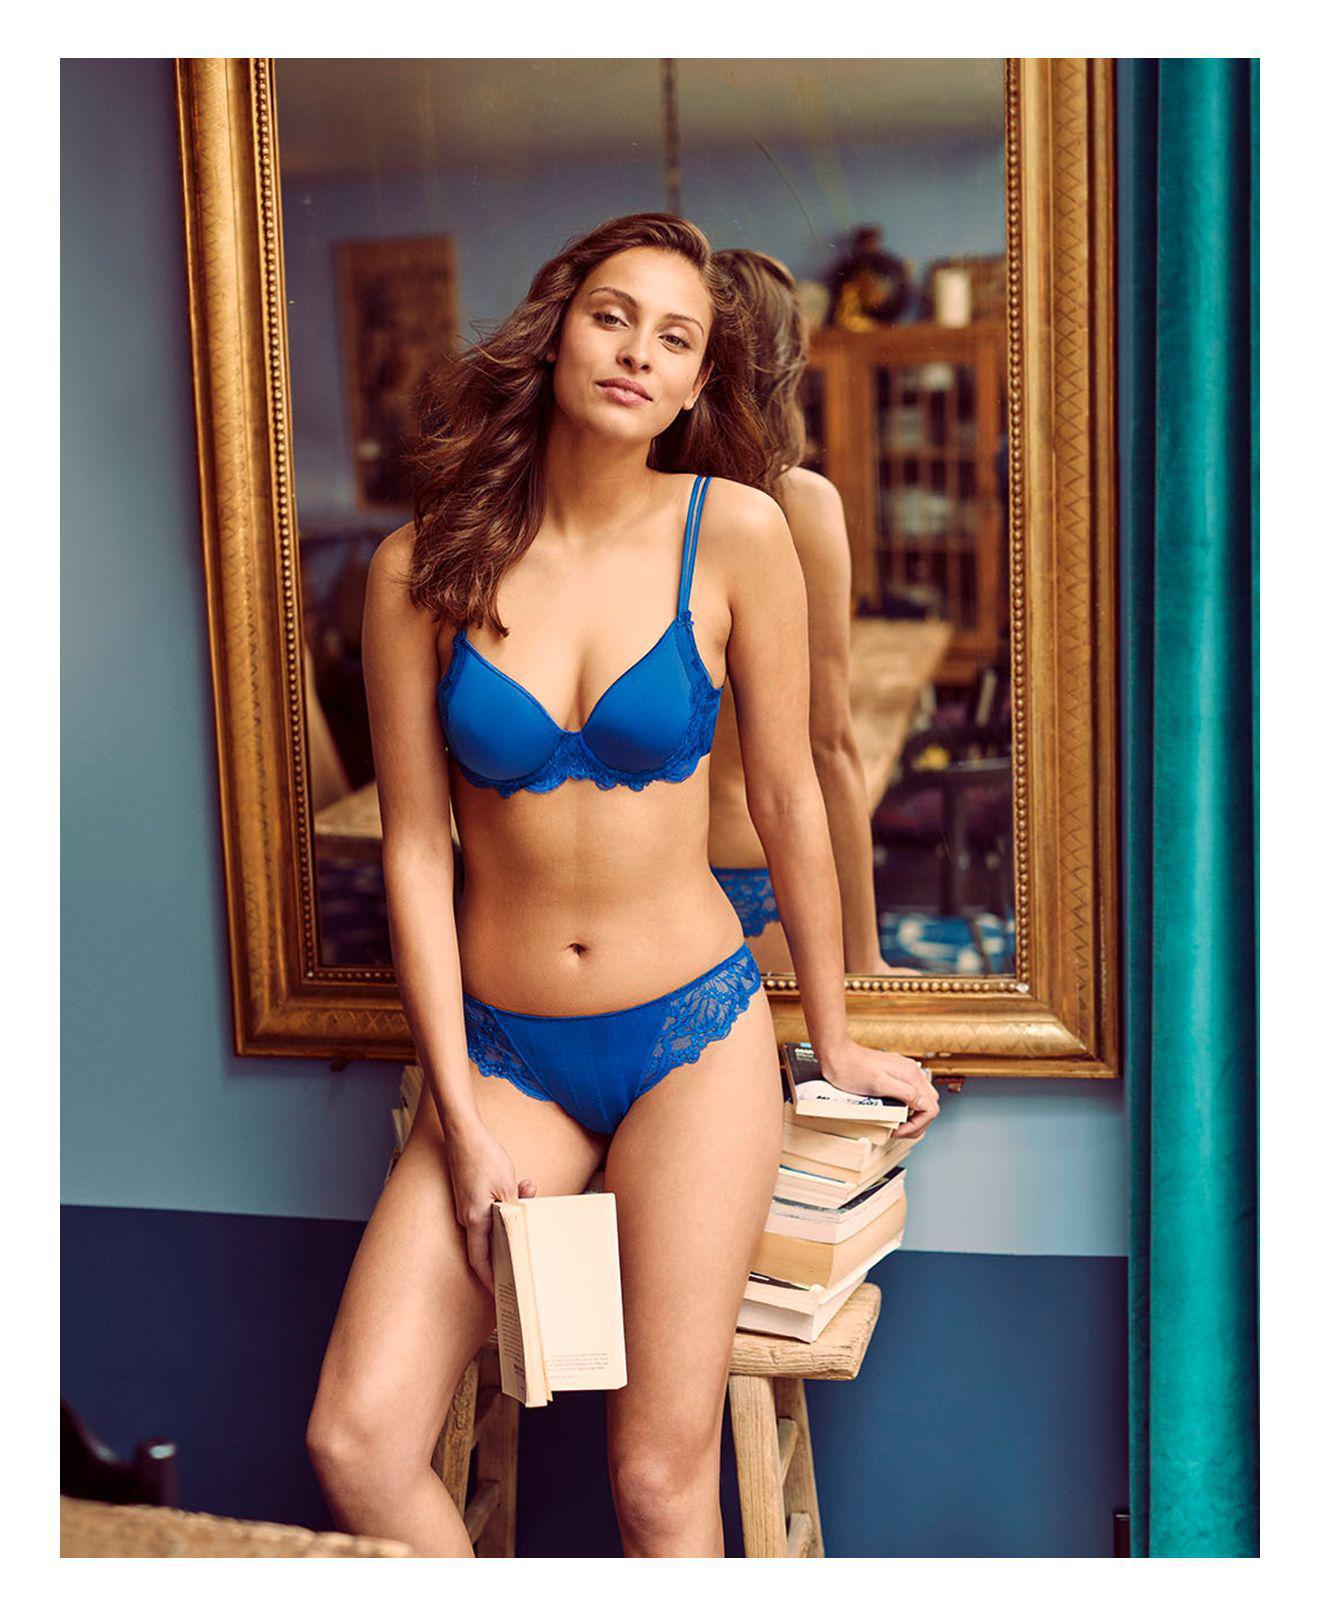 efdf0c4863ee8 Lyst - Simone Perele Simone Pérèle Amour 3d Plunge Contour Bra in Blue